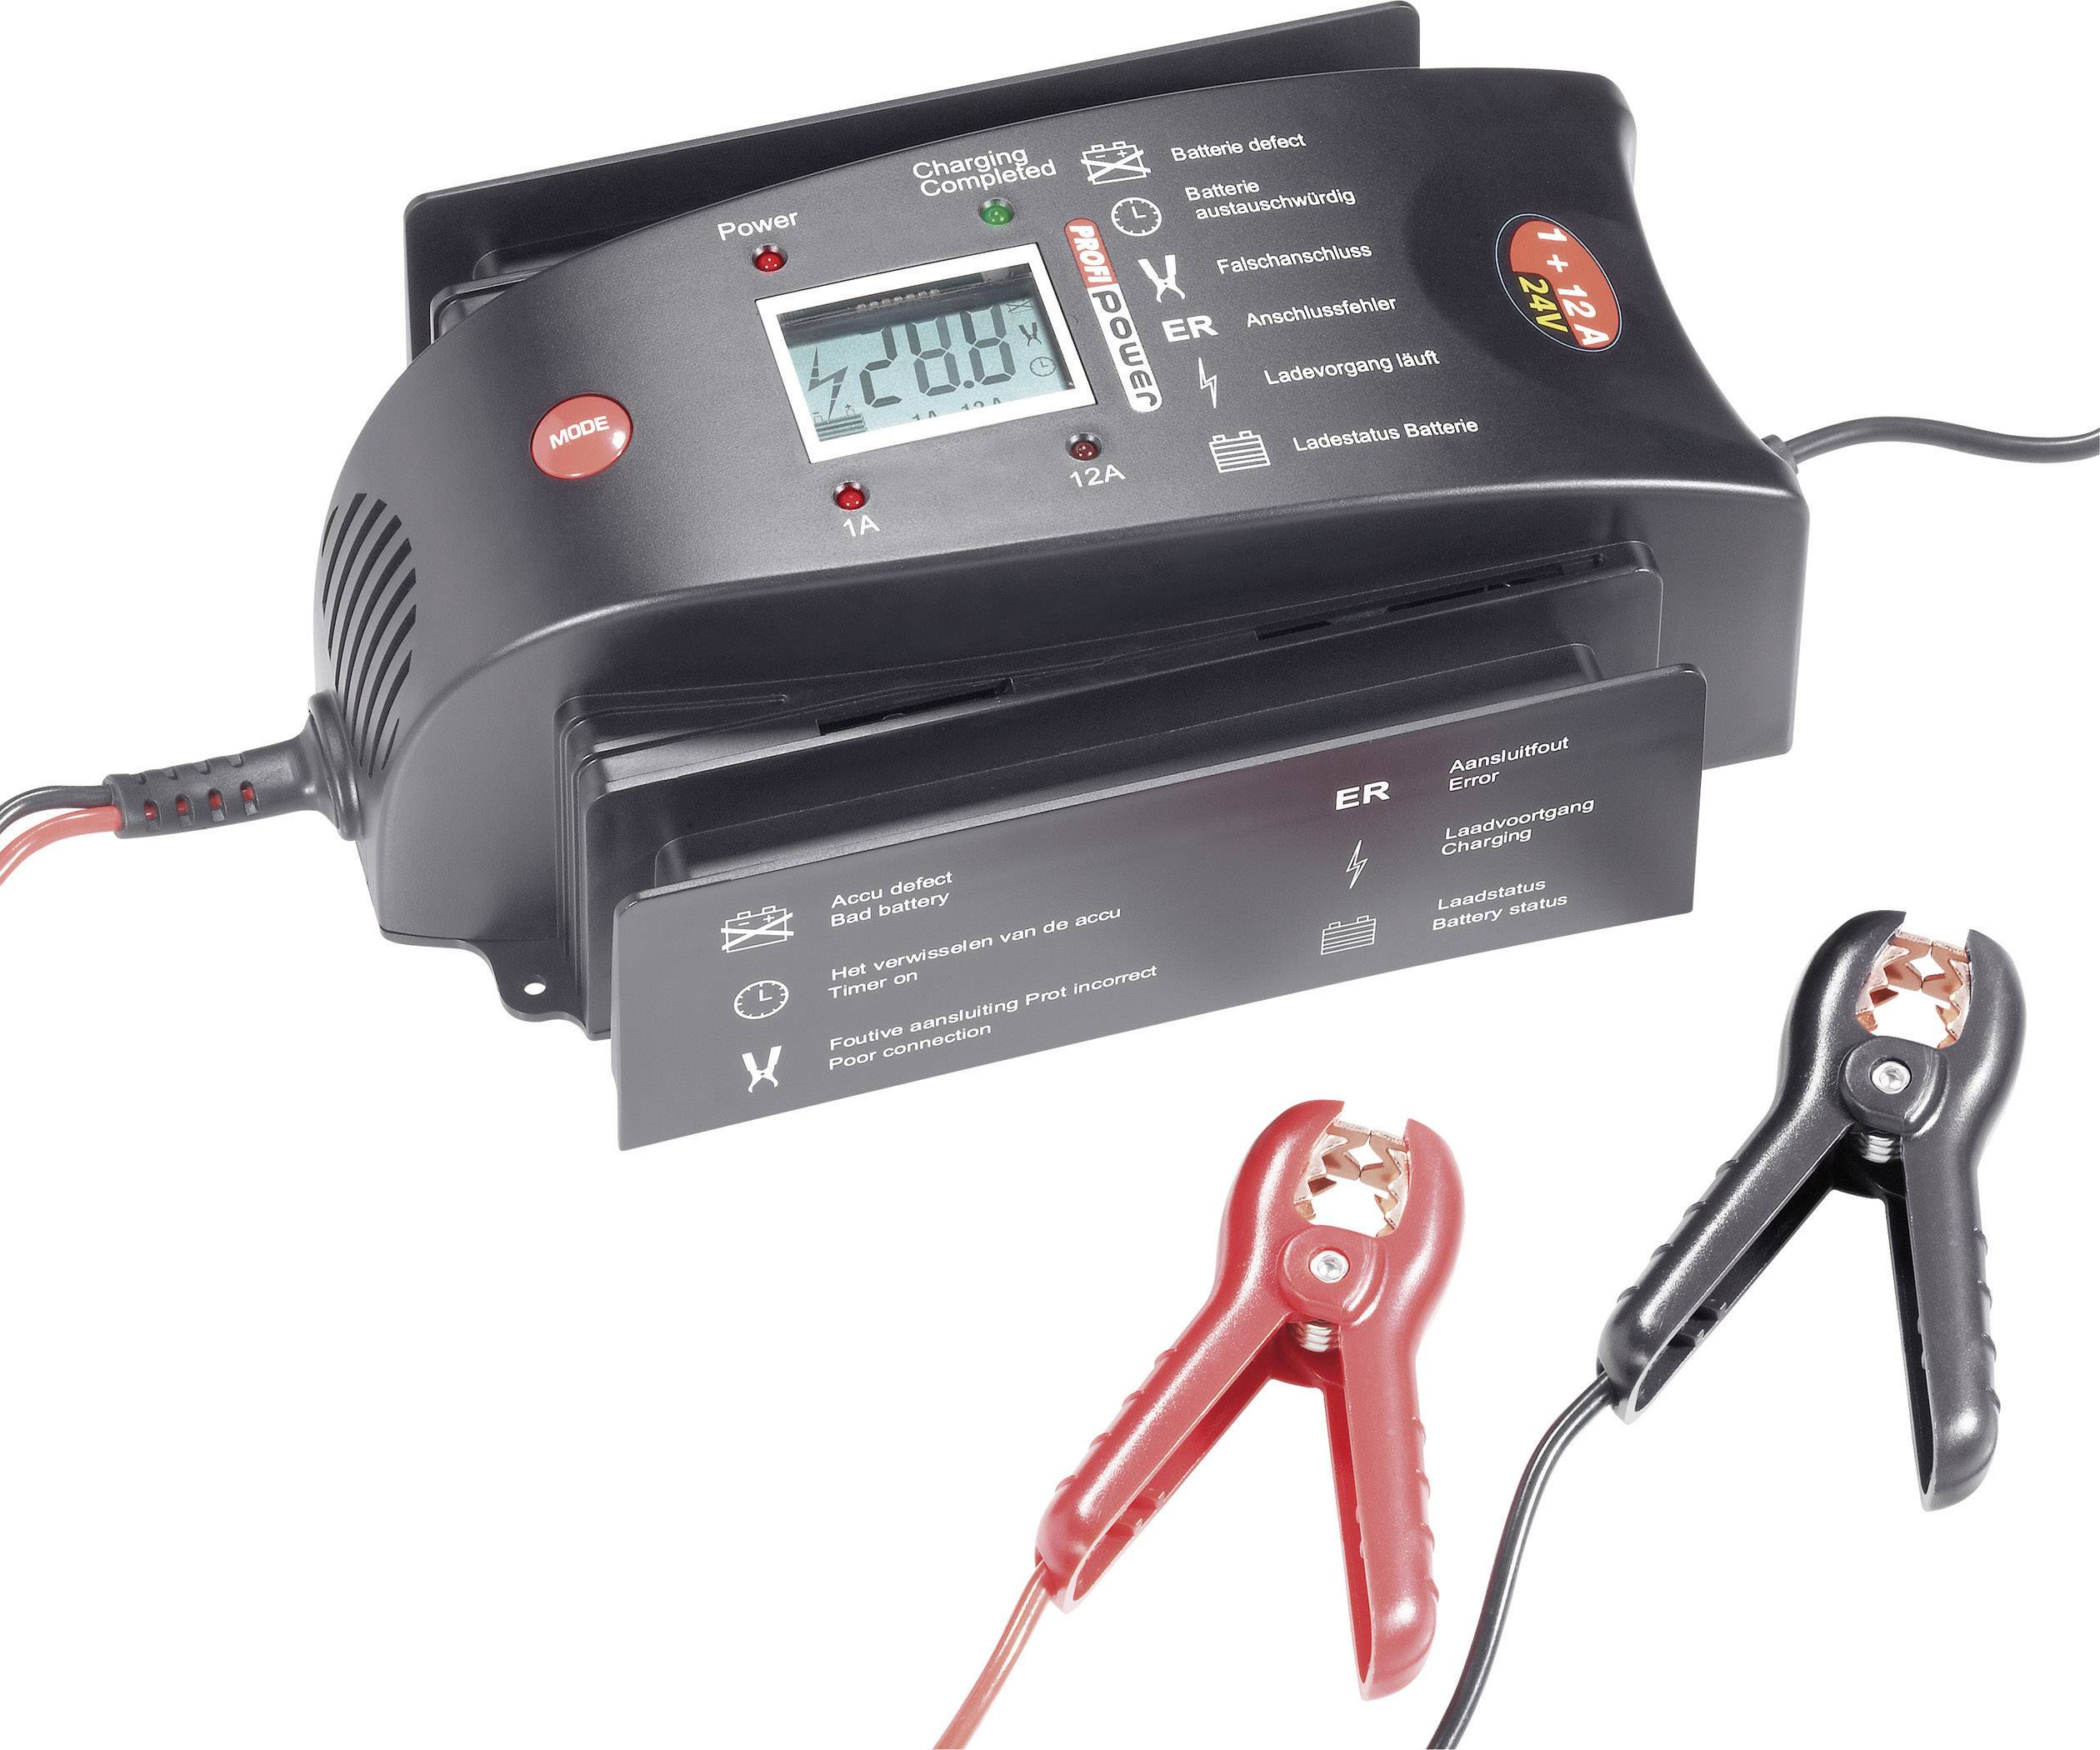 Nabíjačka autobatérie Profi Power LCD 1+12A, 24 V, 1 A, 12 A